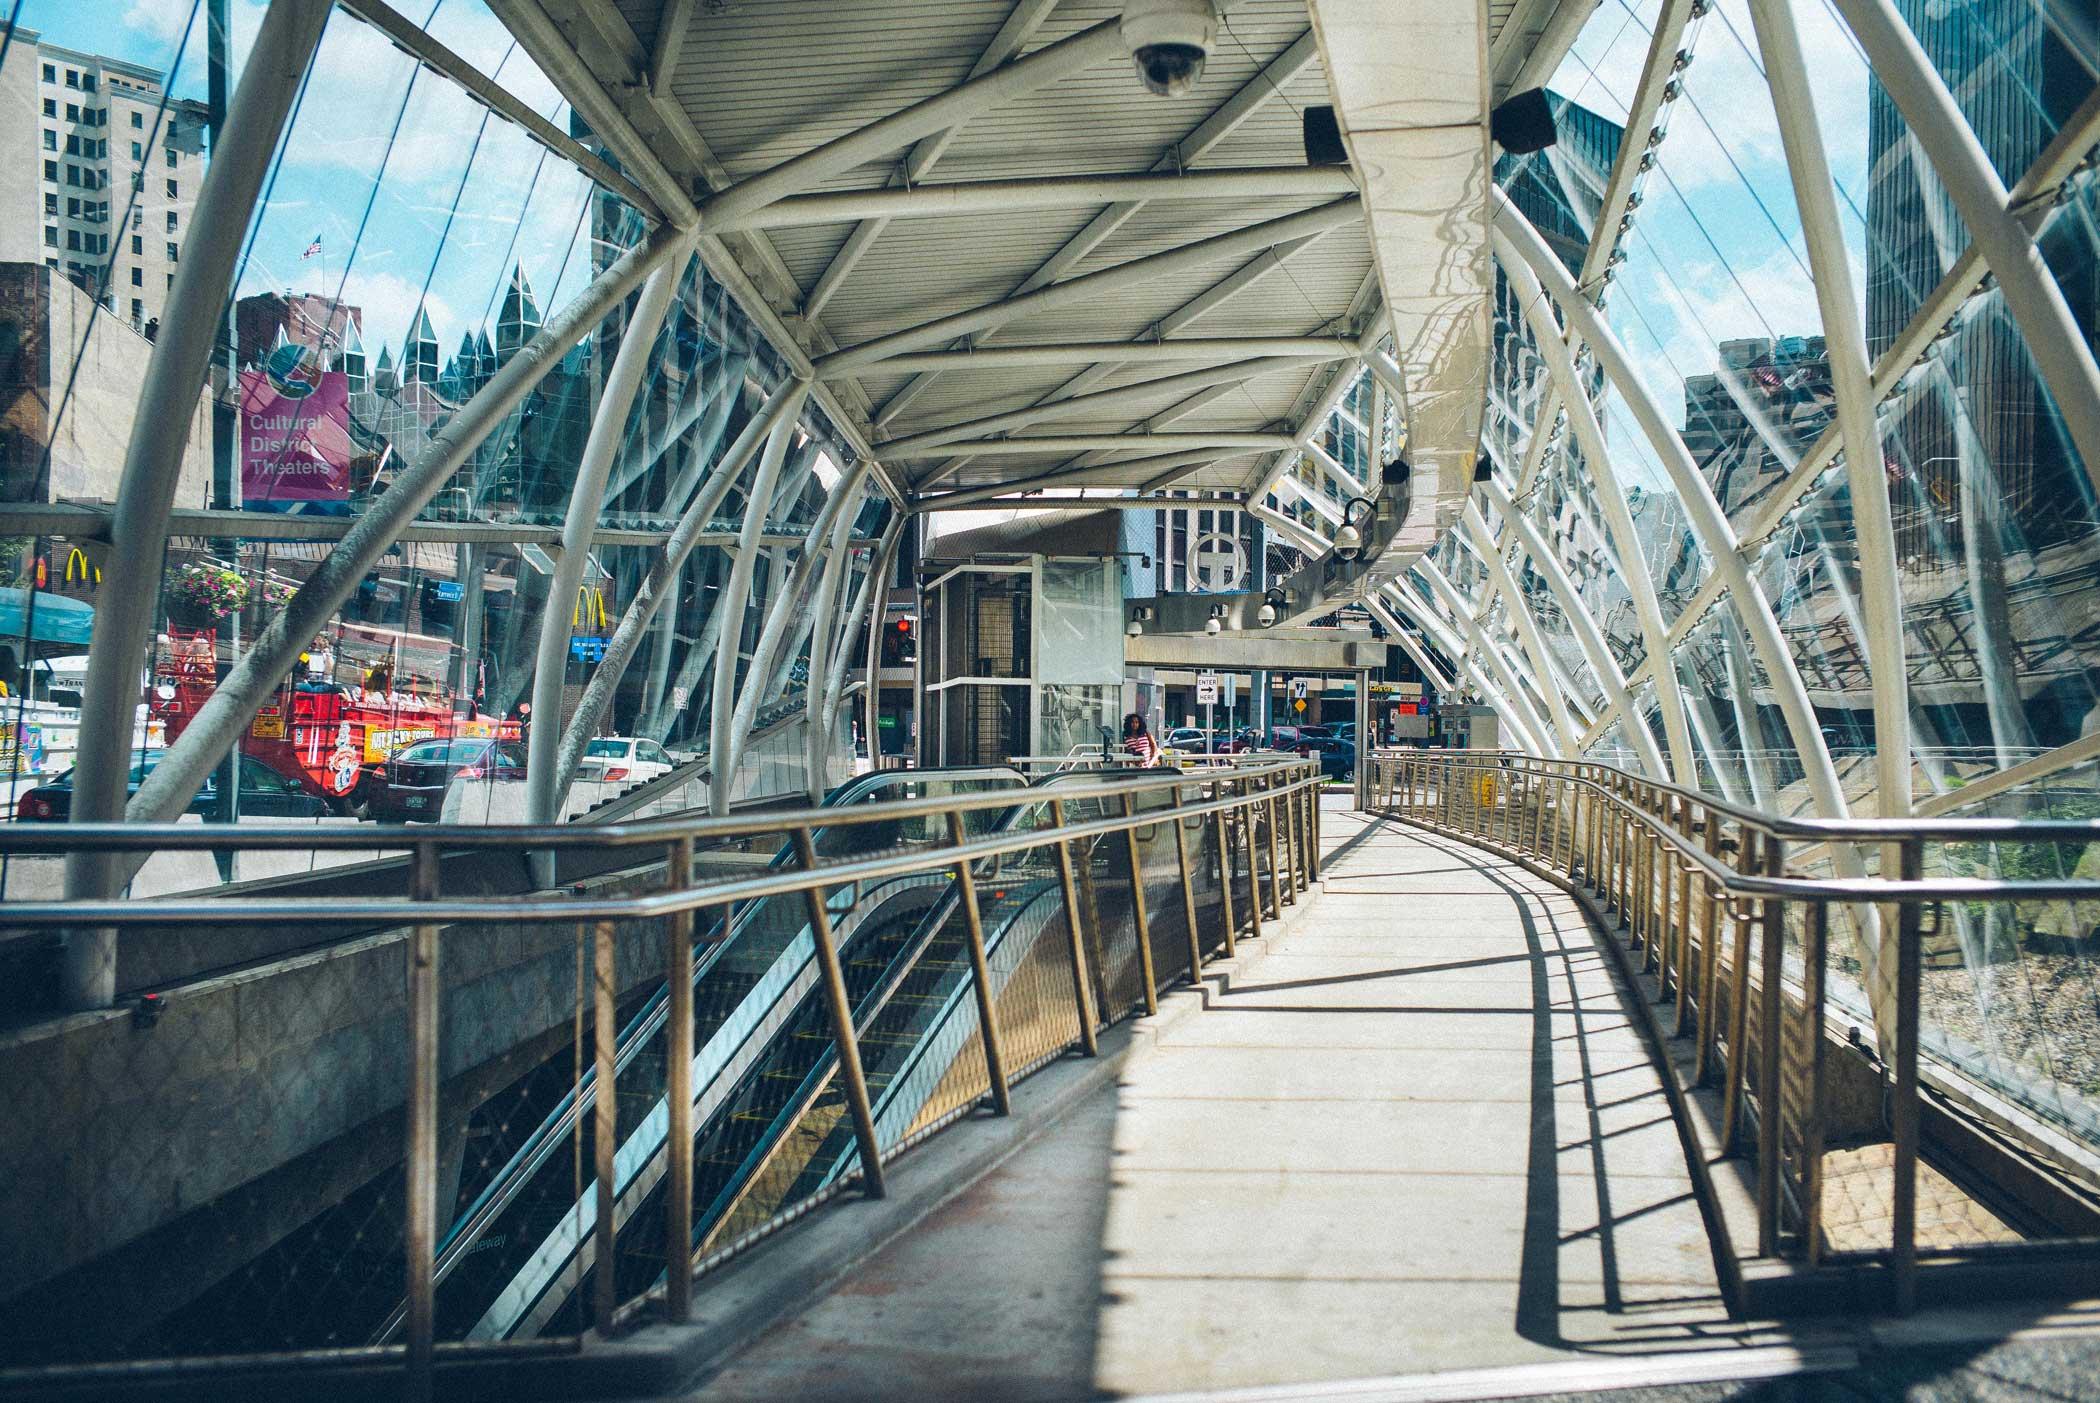 Gateway Pittsburgh Gateway Light Rail Station on June 24, 2015.